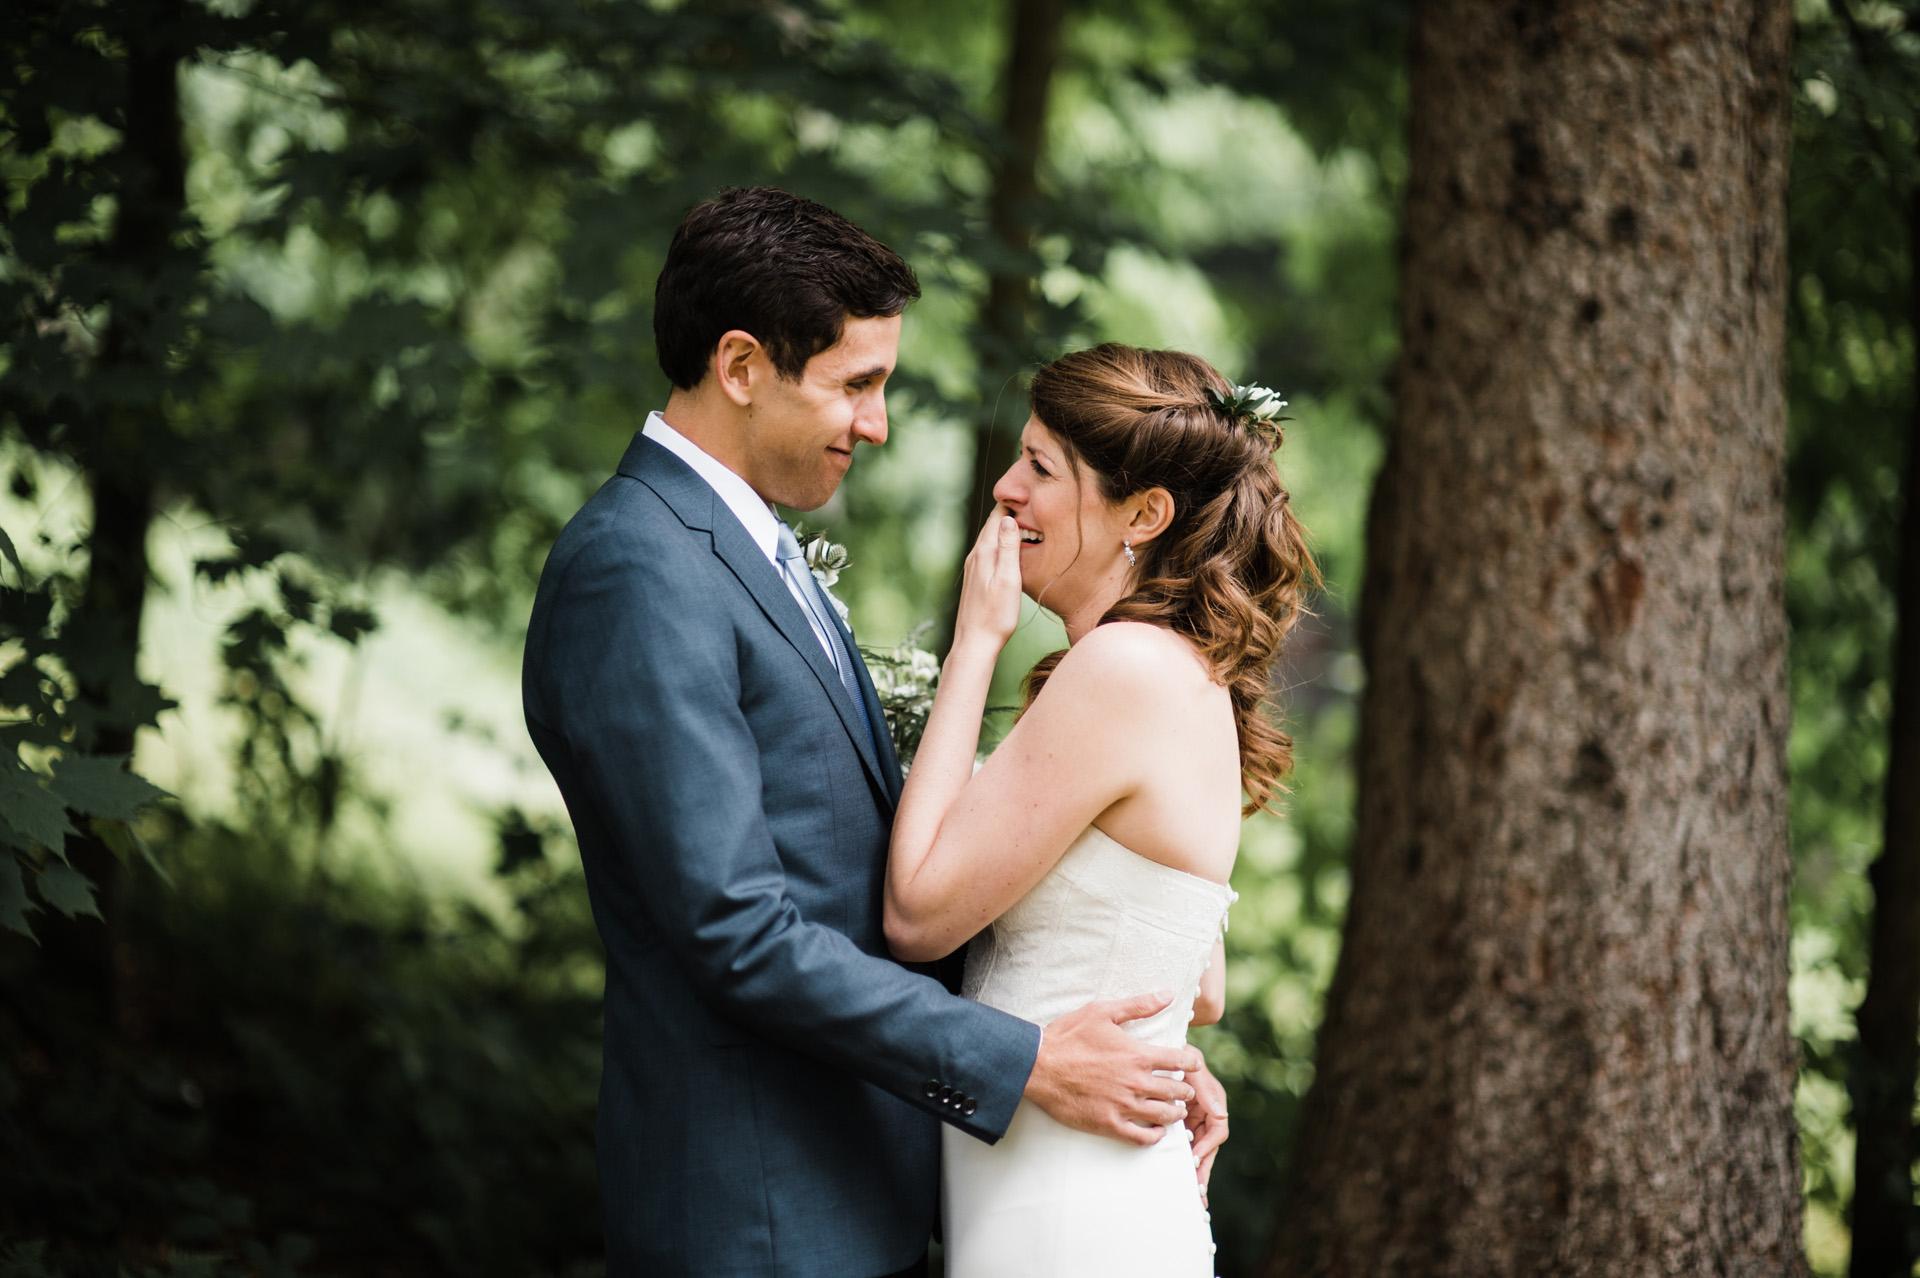 west-mountain-inn-wedding-vermont-10